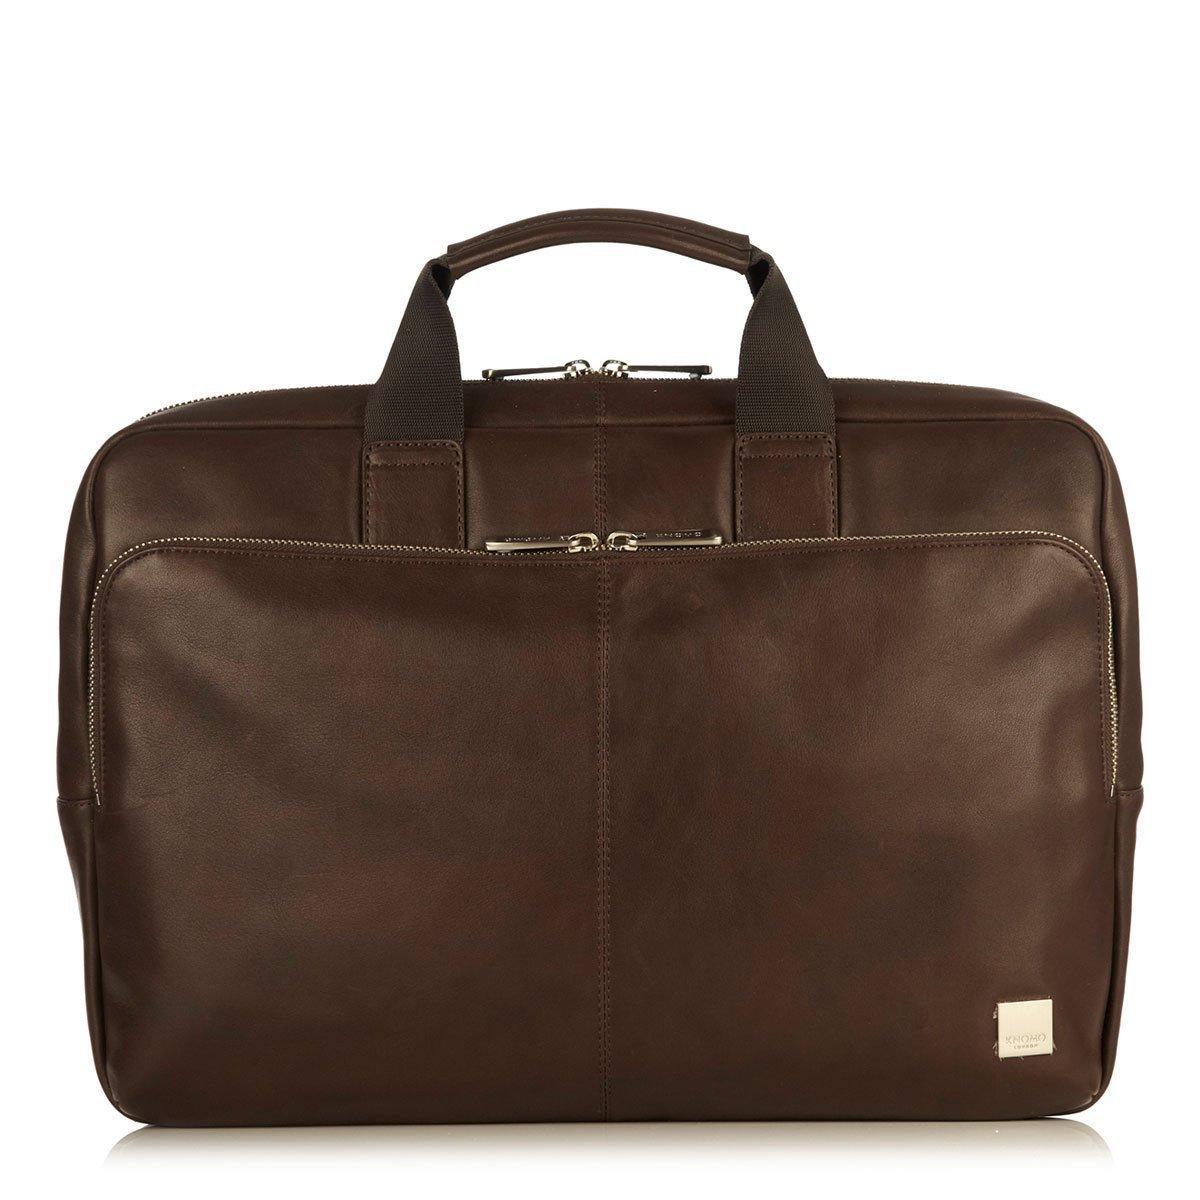 a9cb61965c Formal Bags for Men for sale - Business Bags for Men online brands ...